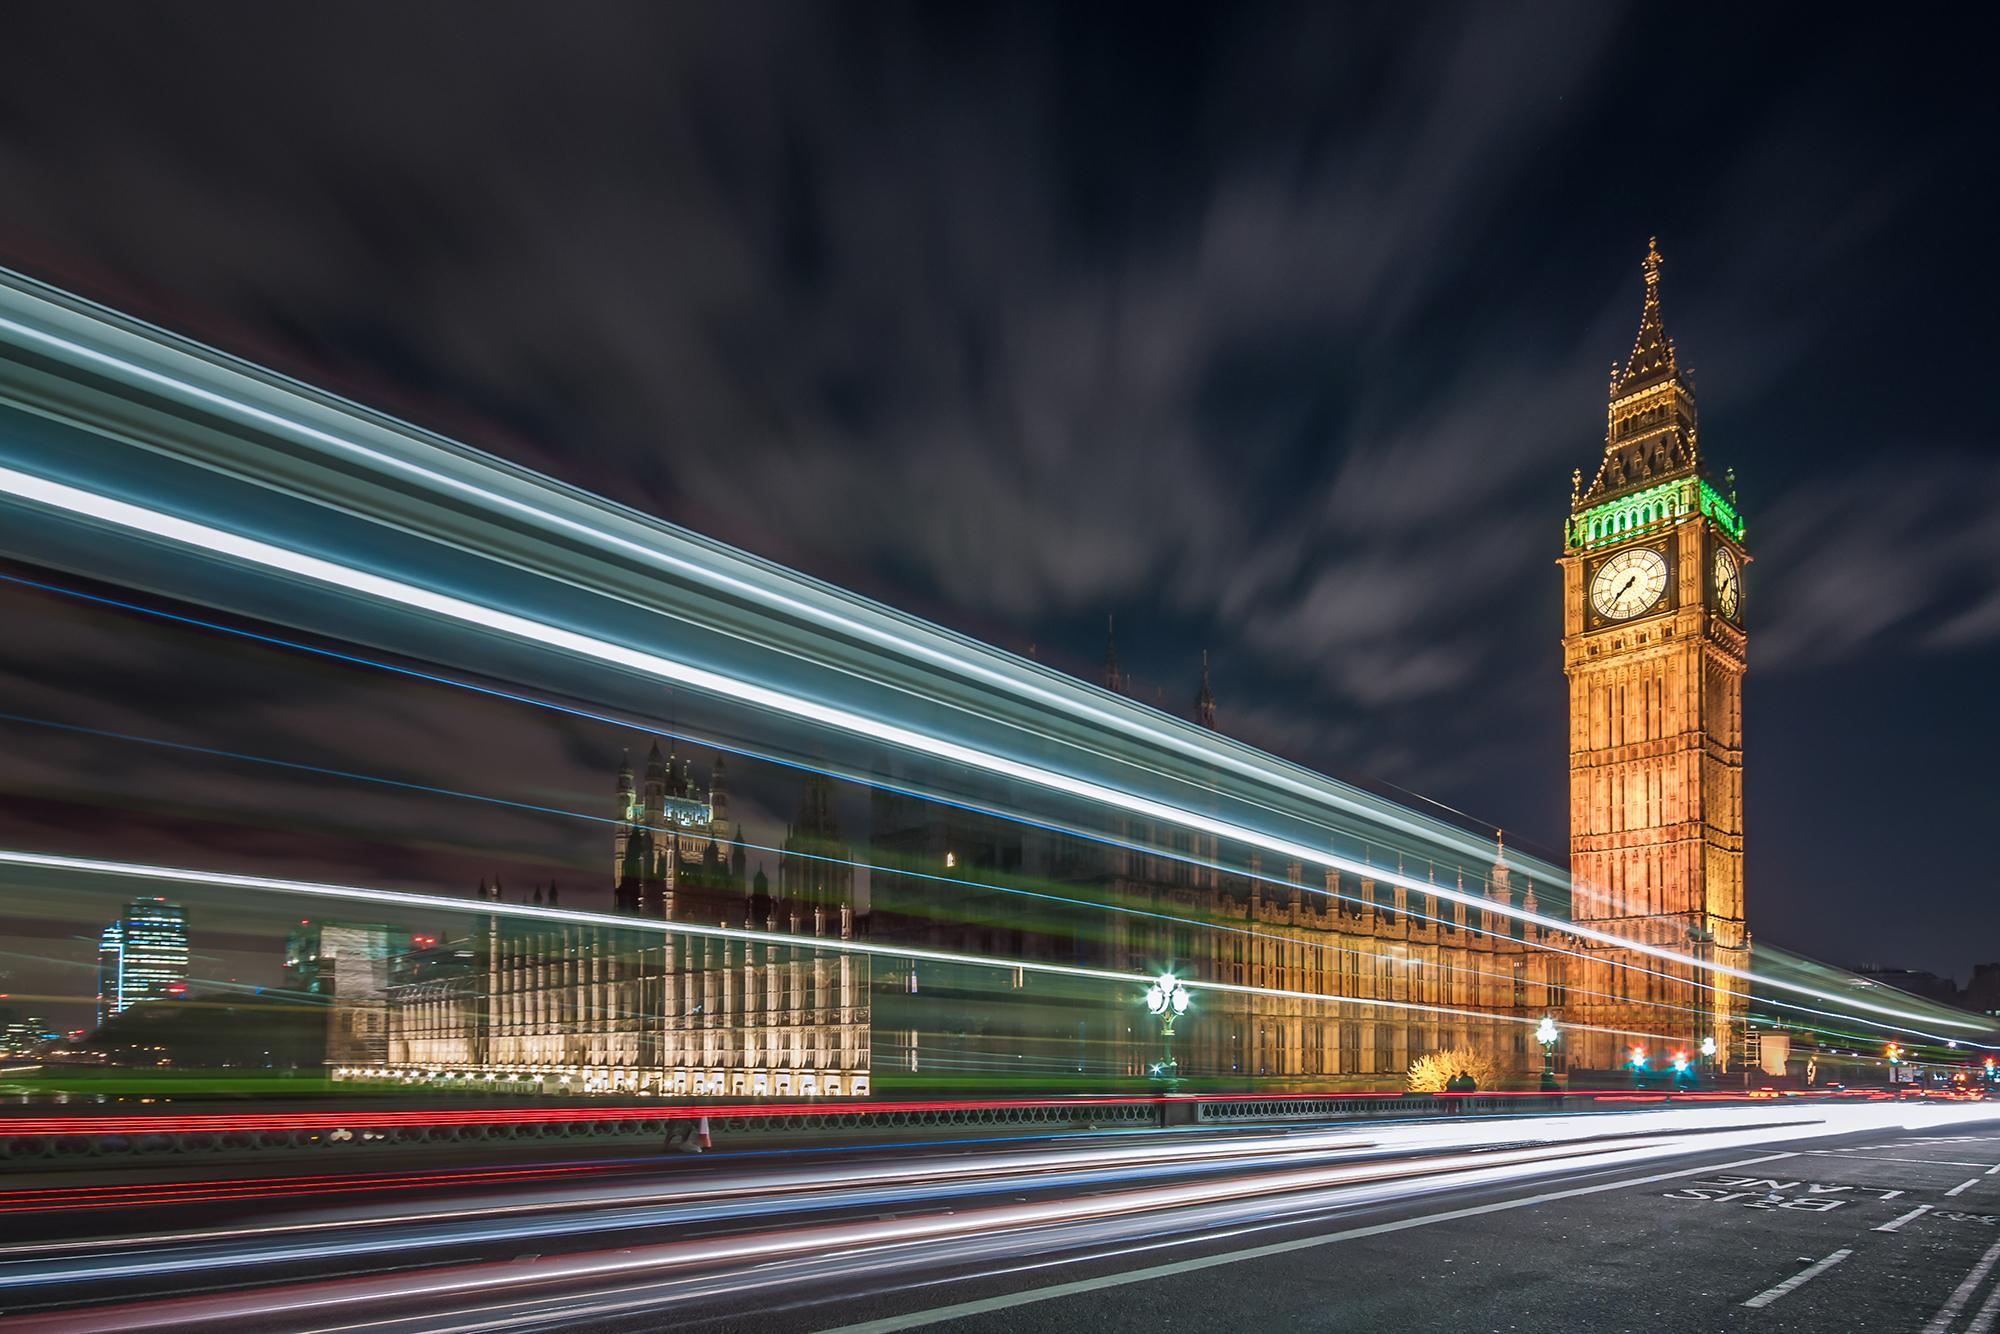 150218 - London - Night - Westminster 001.jpg